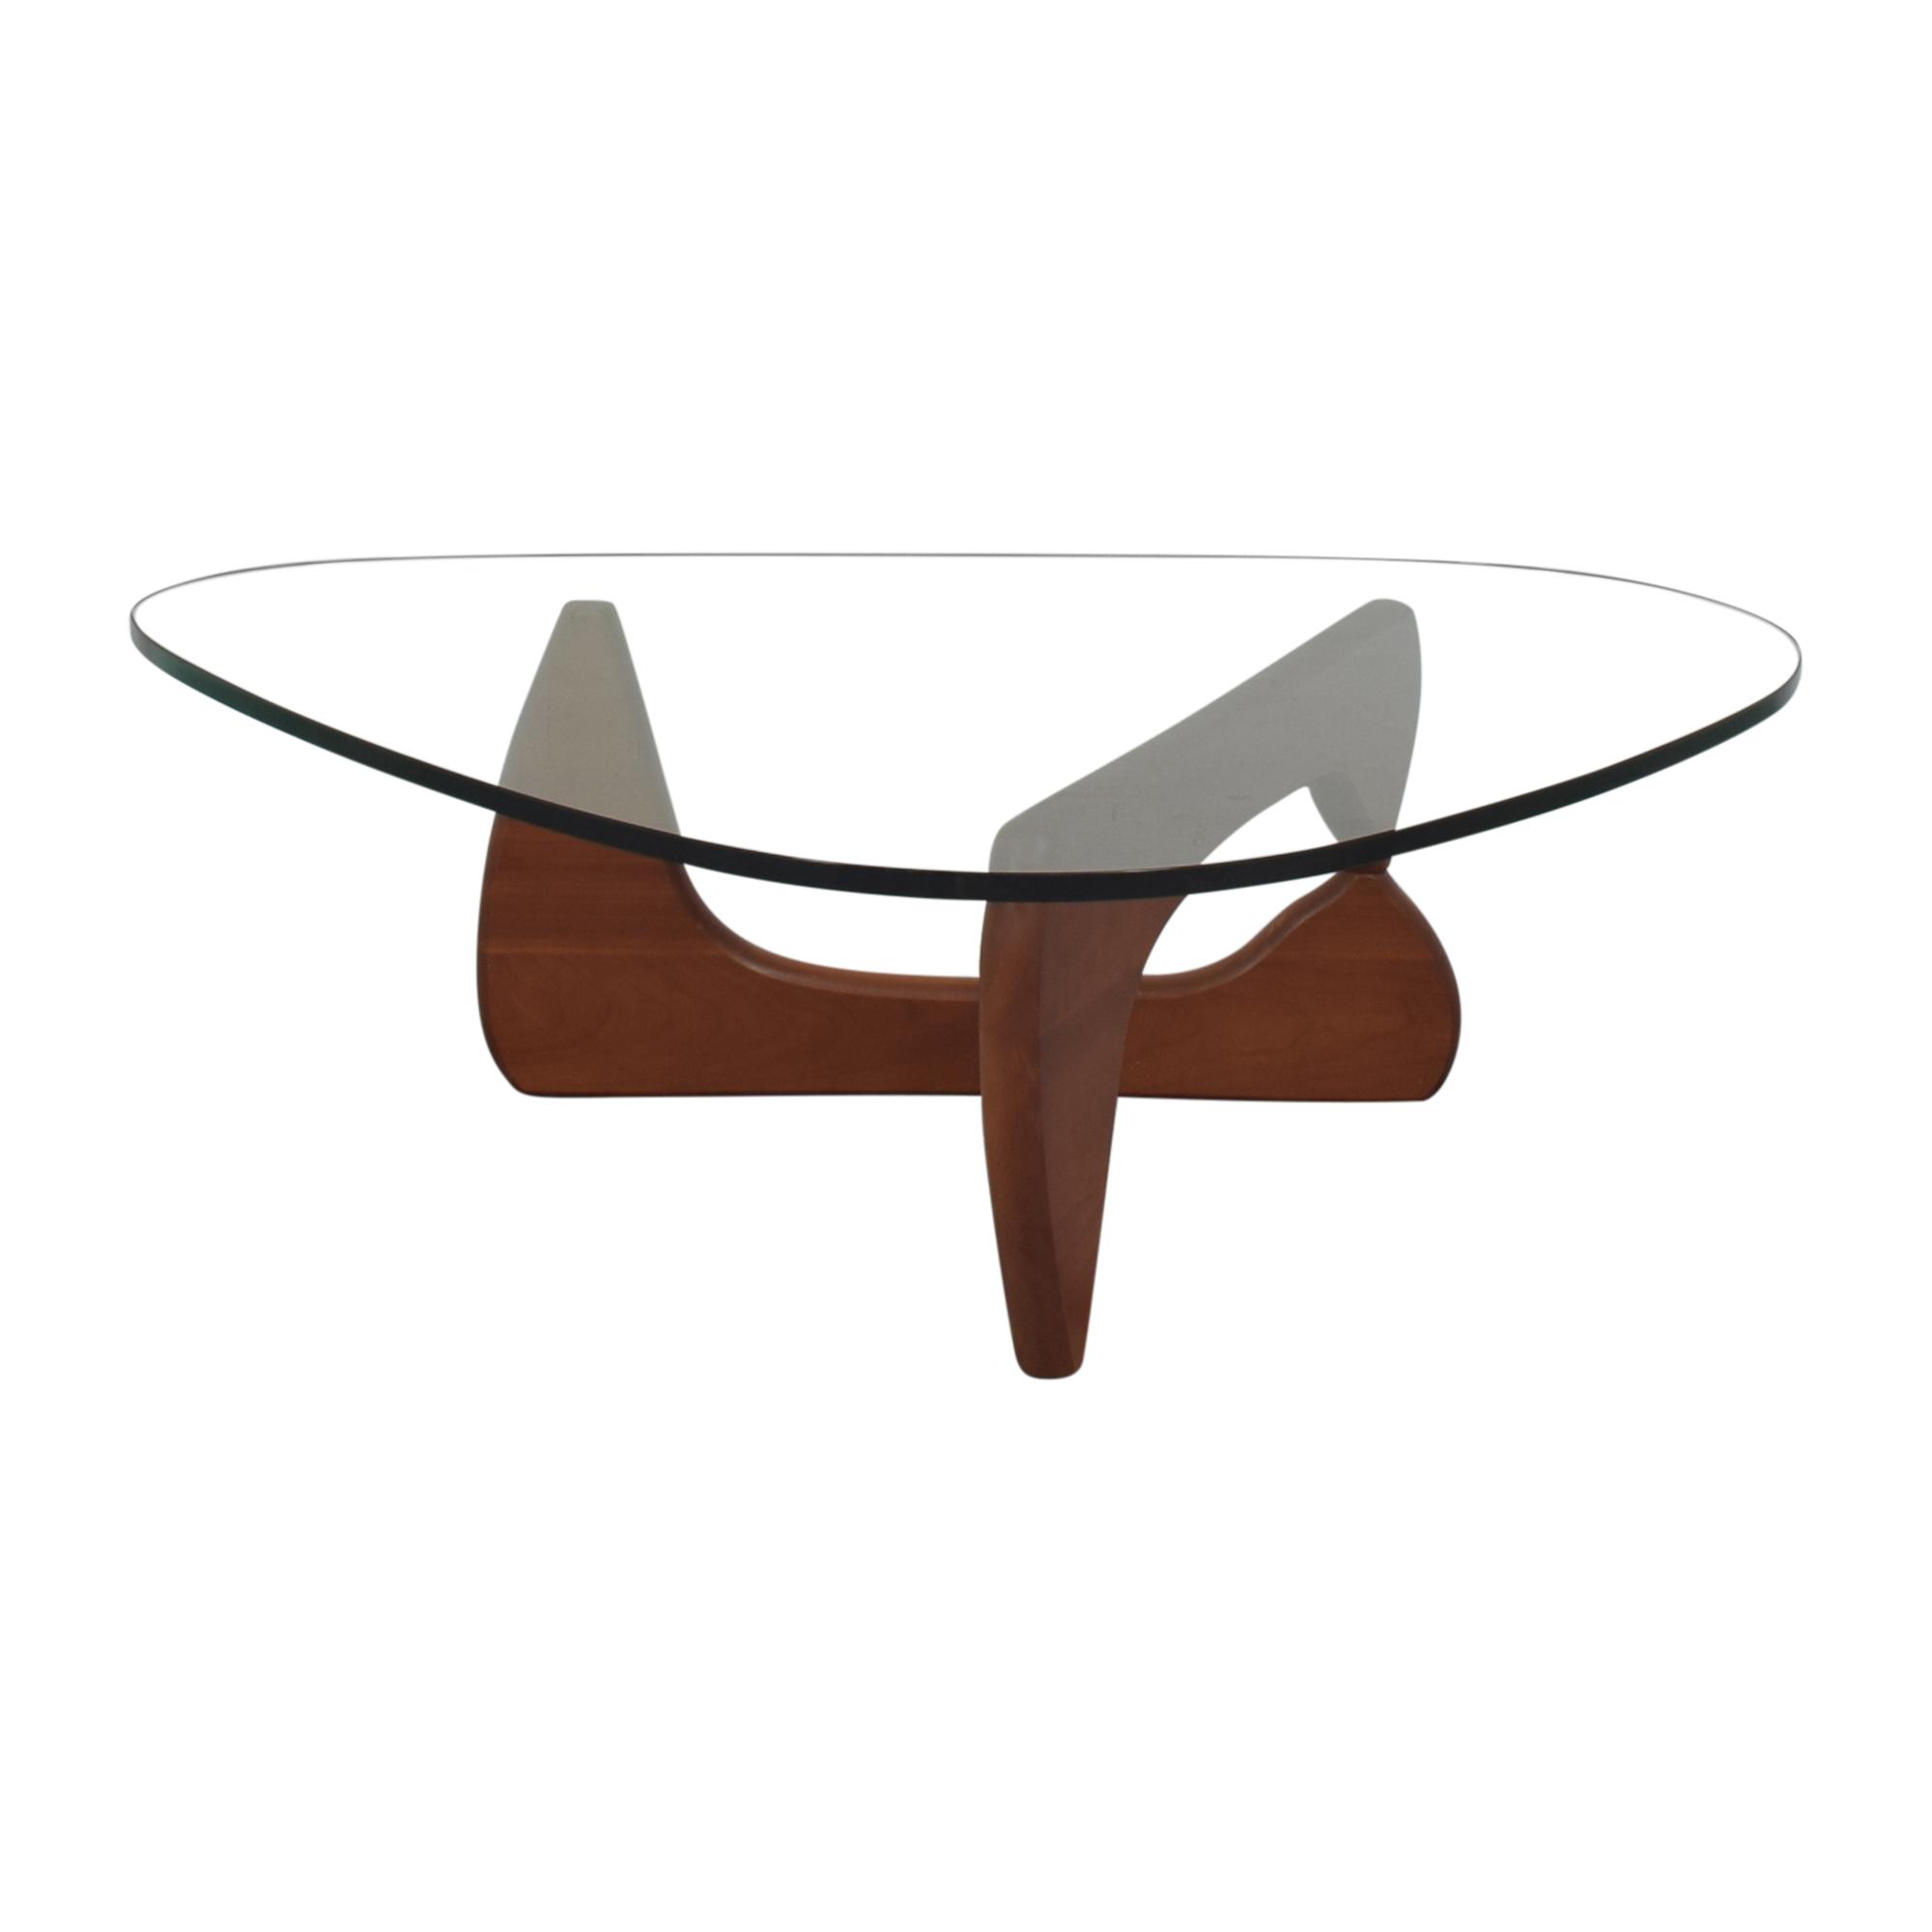 Herman Miller Design Within Reach Herman Miller Noguchi Coffee Table brown